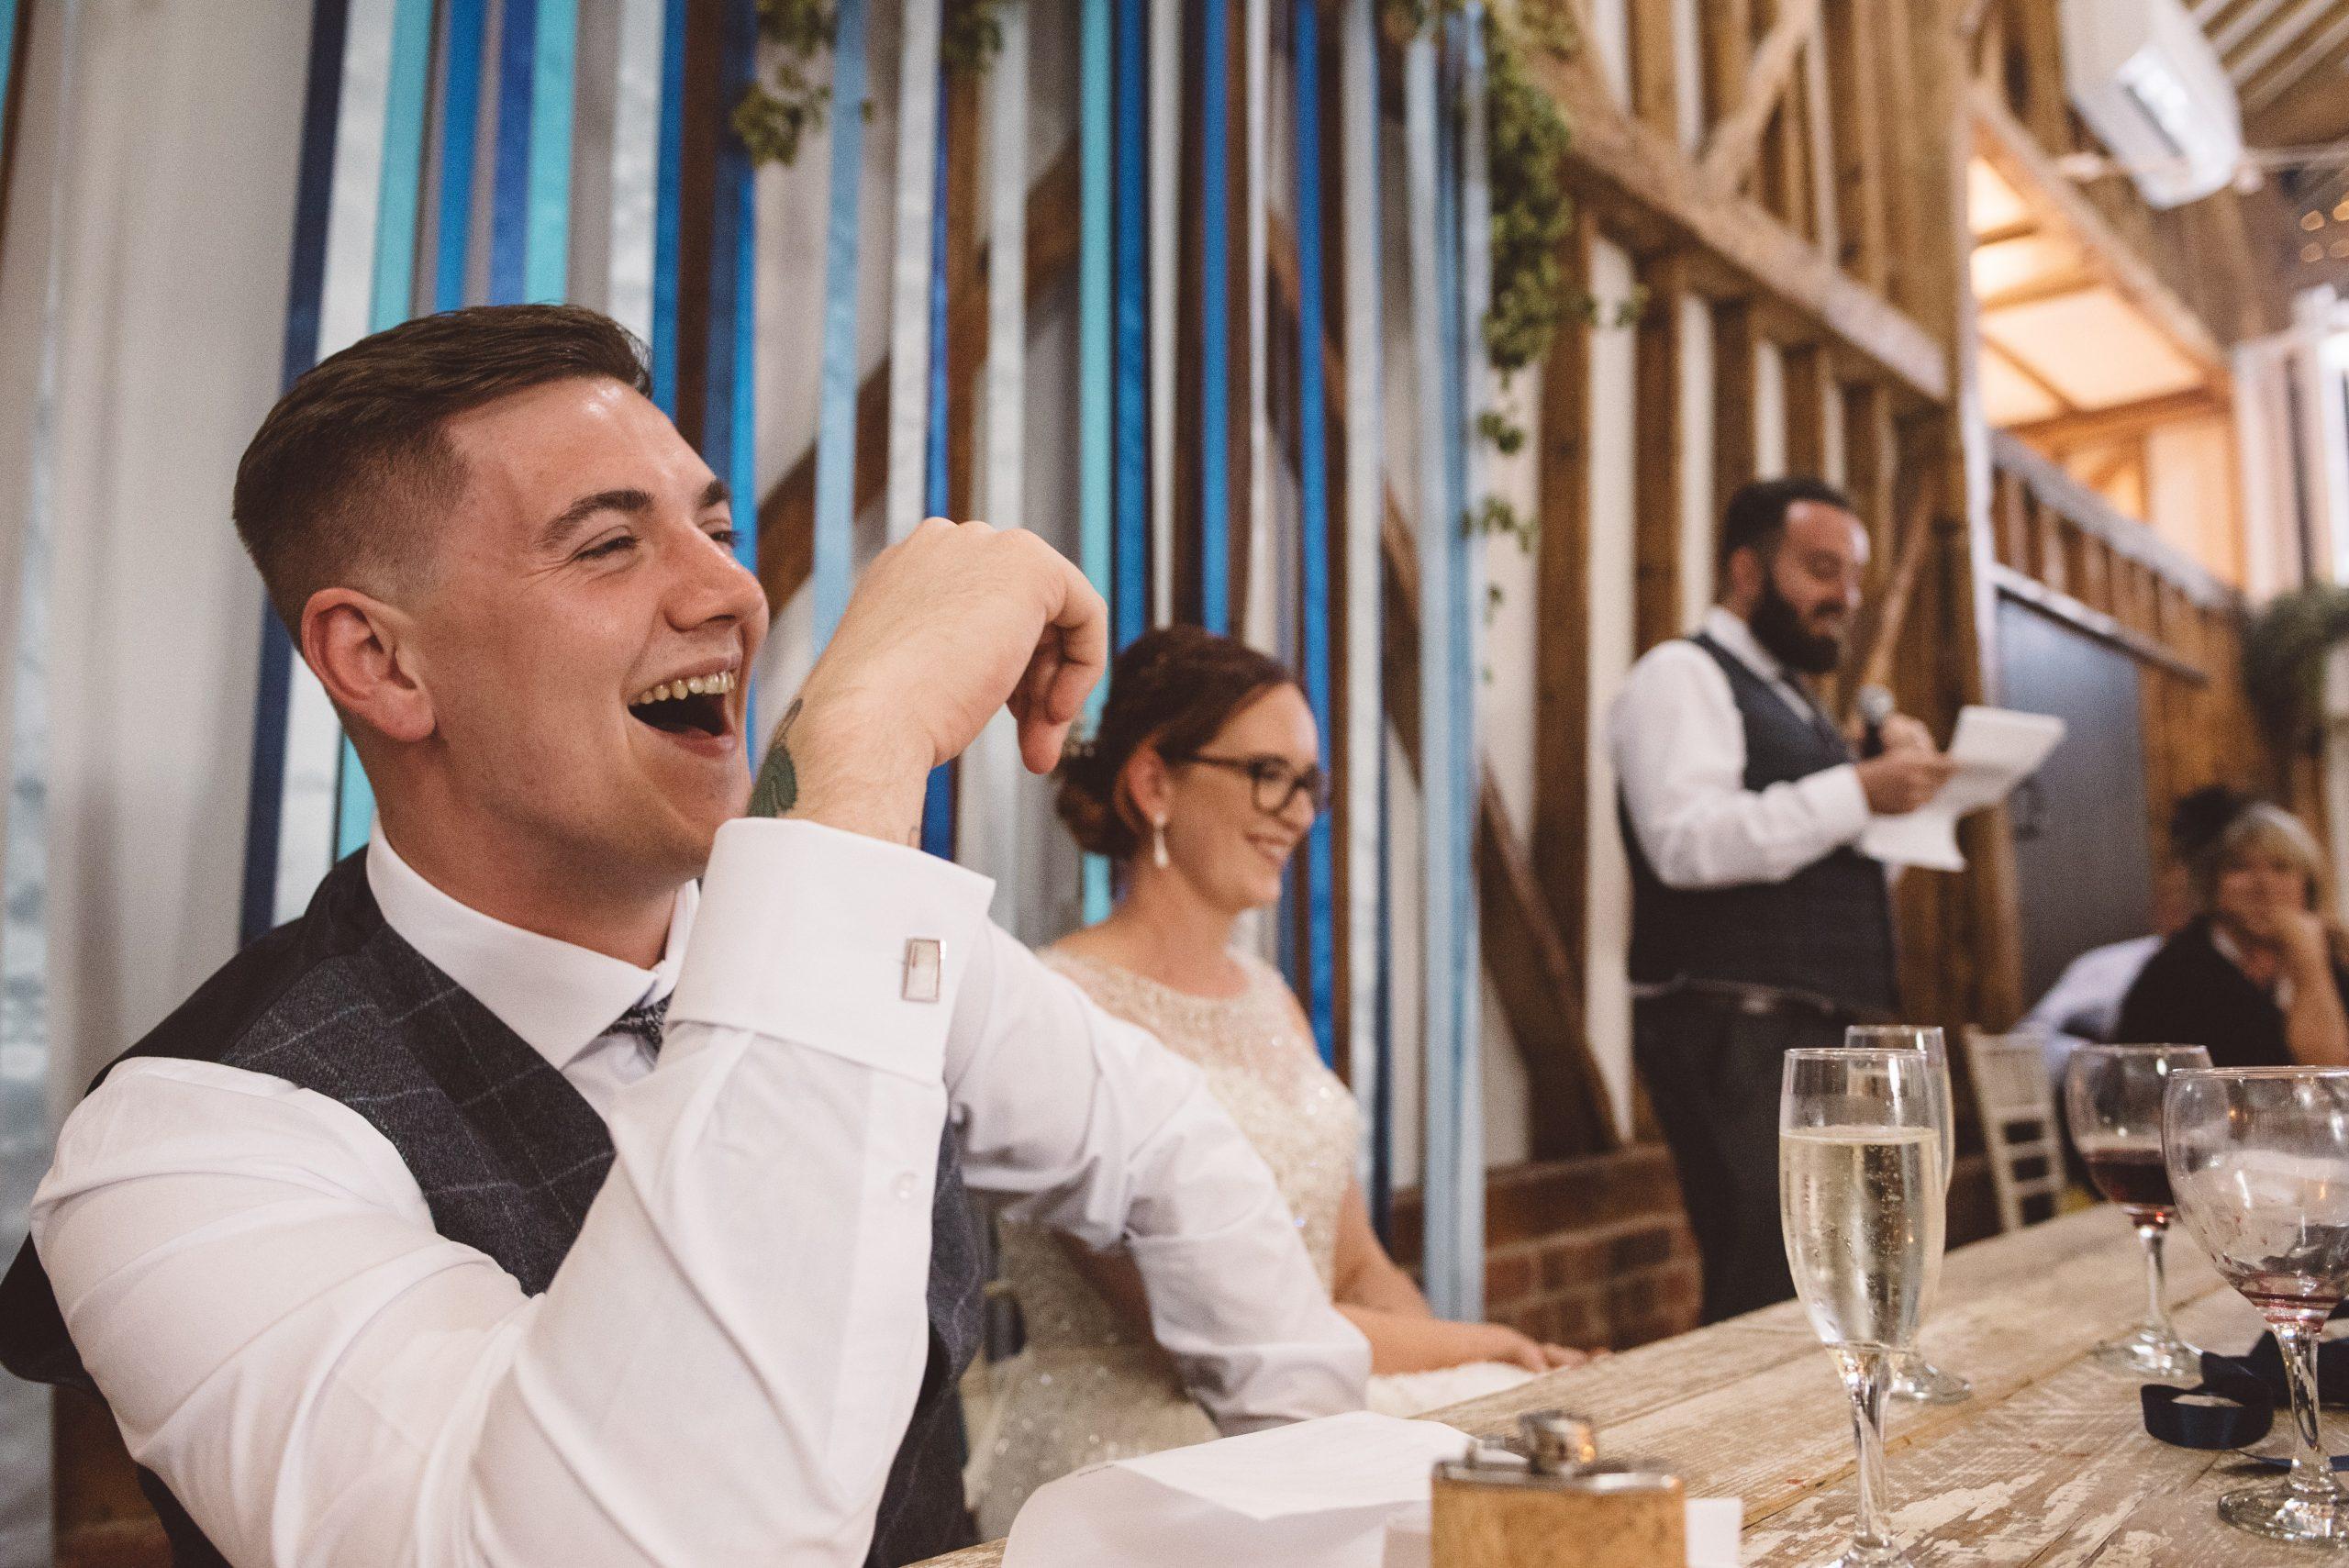 fun wedding speech at Milling Barn wedding venue